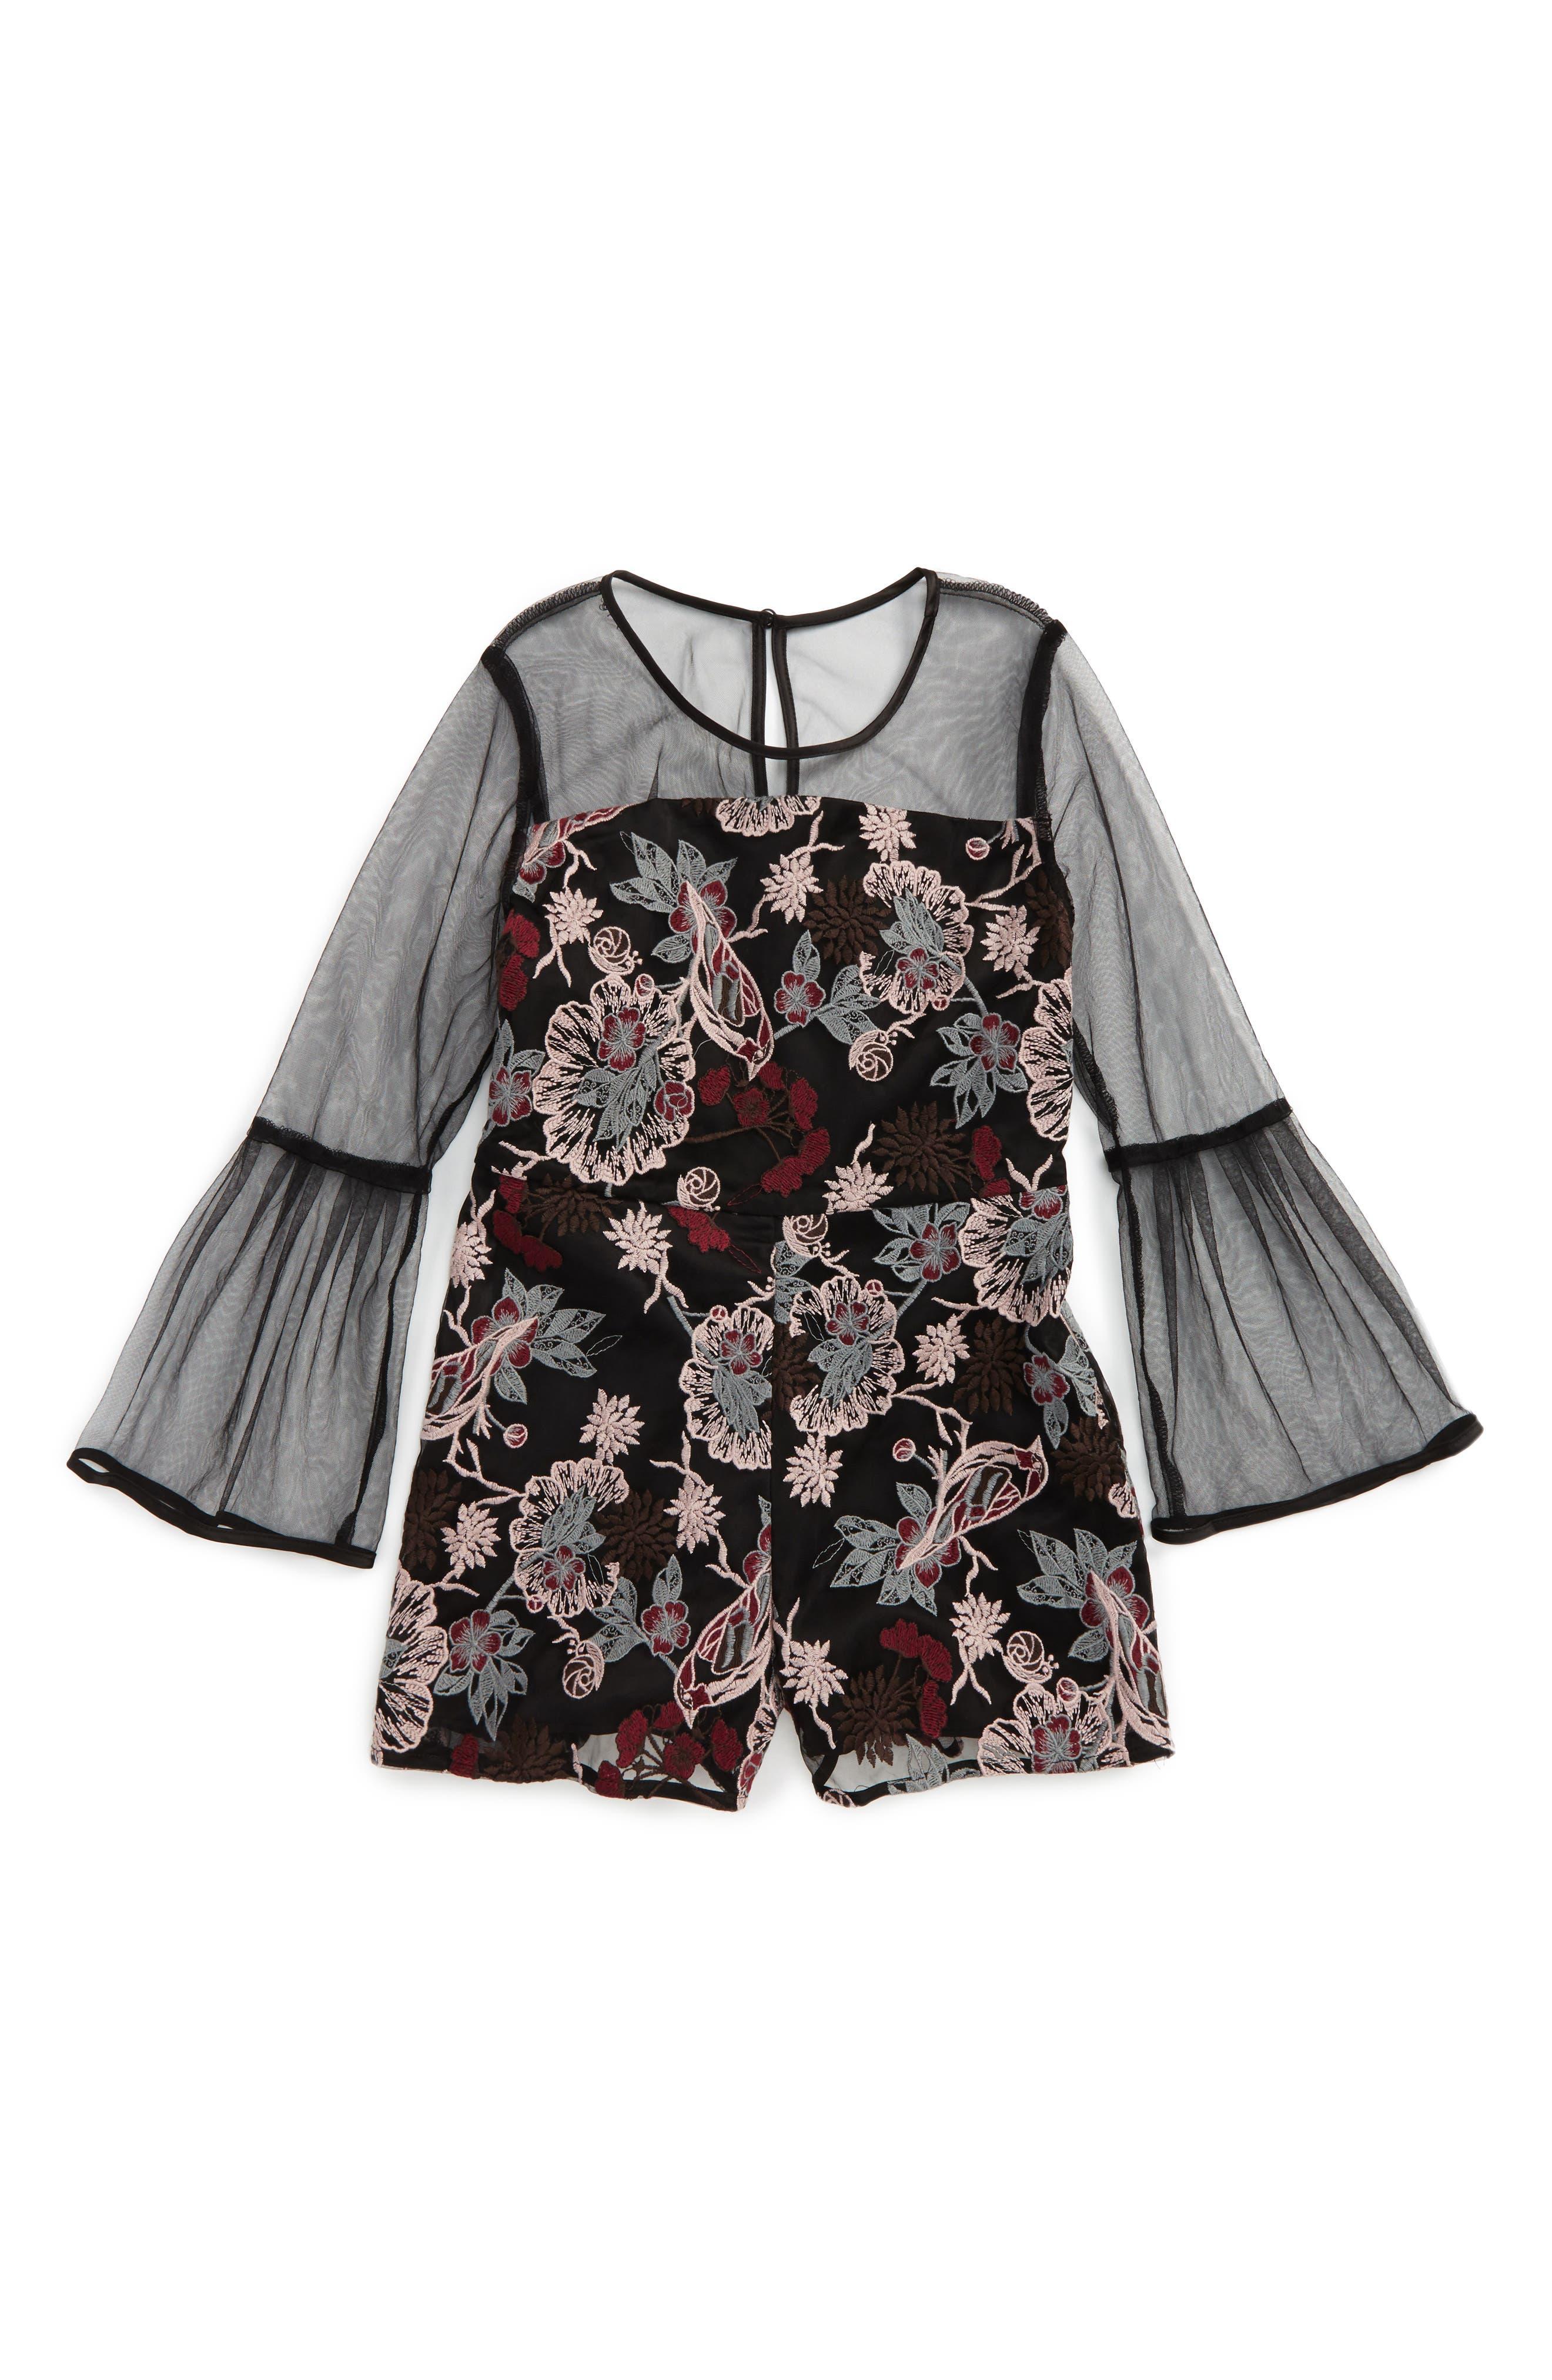 Main Image - Bardot Junior Embroidered Romper (Big Girls)